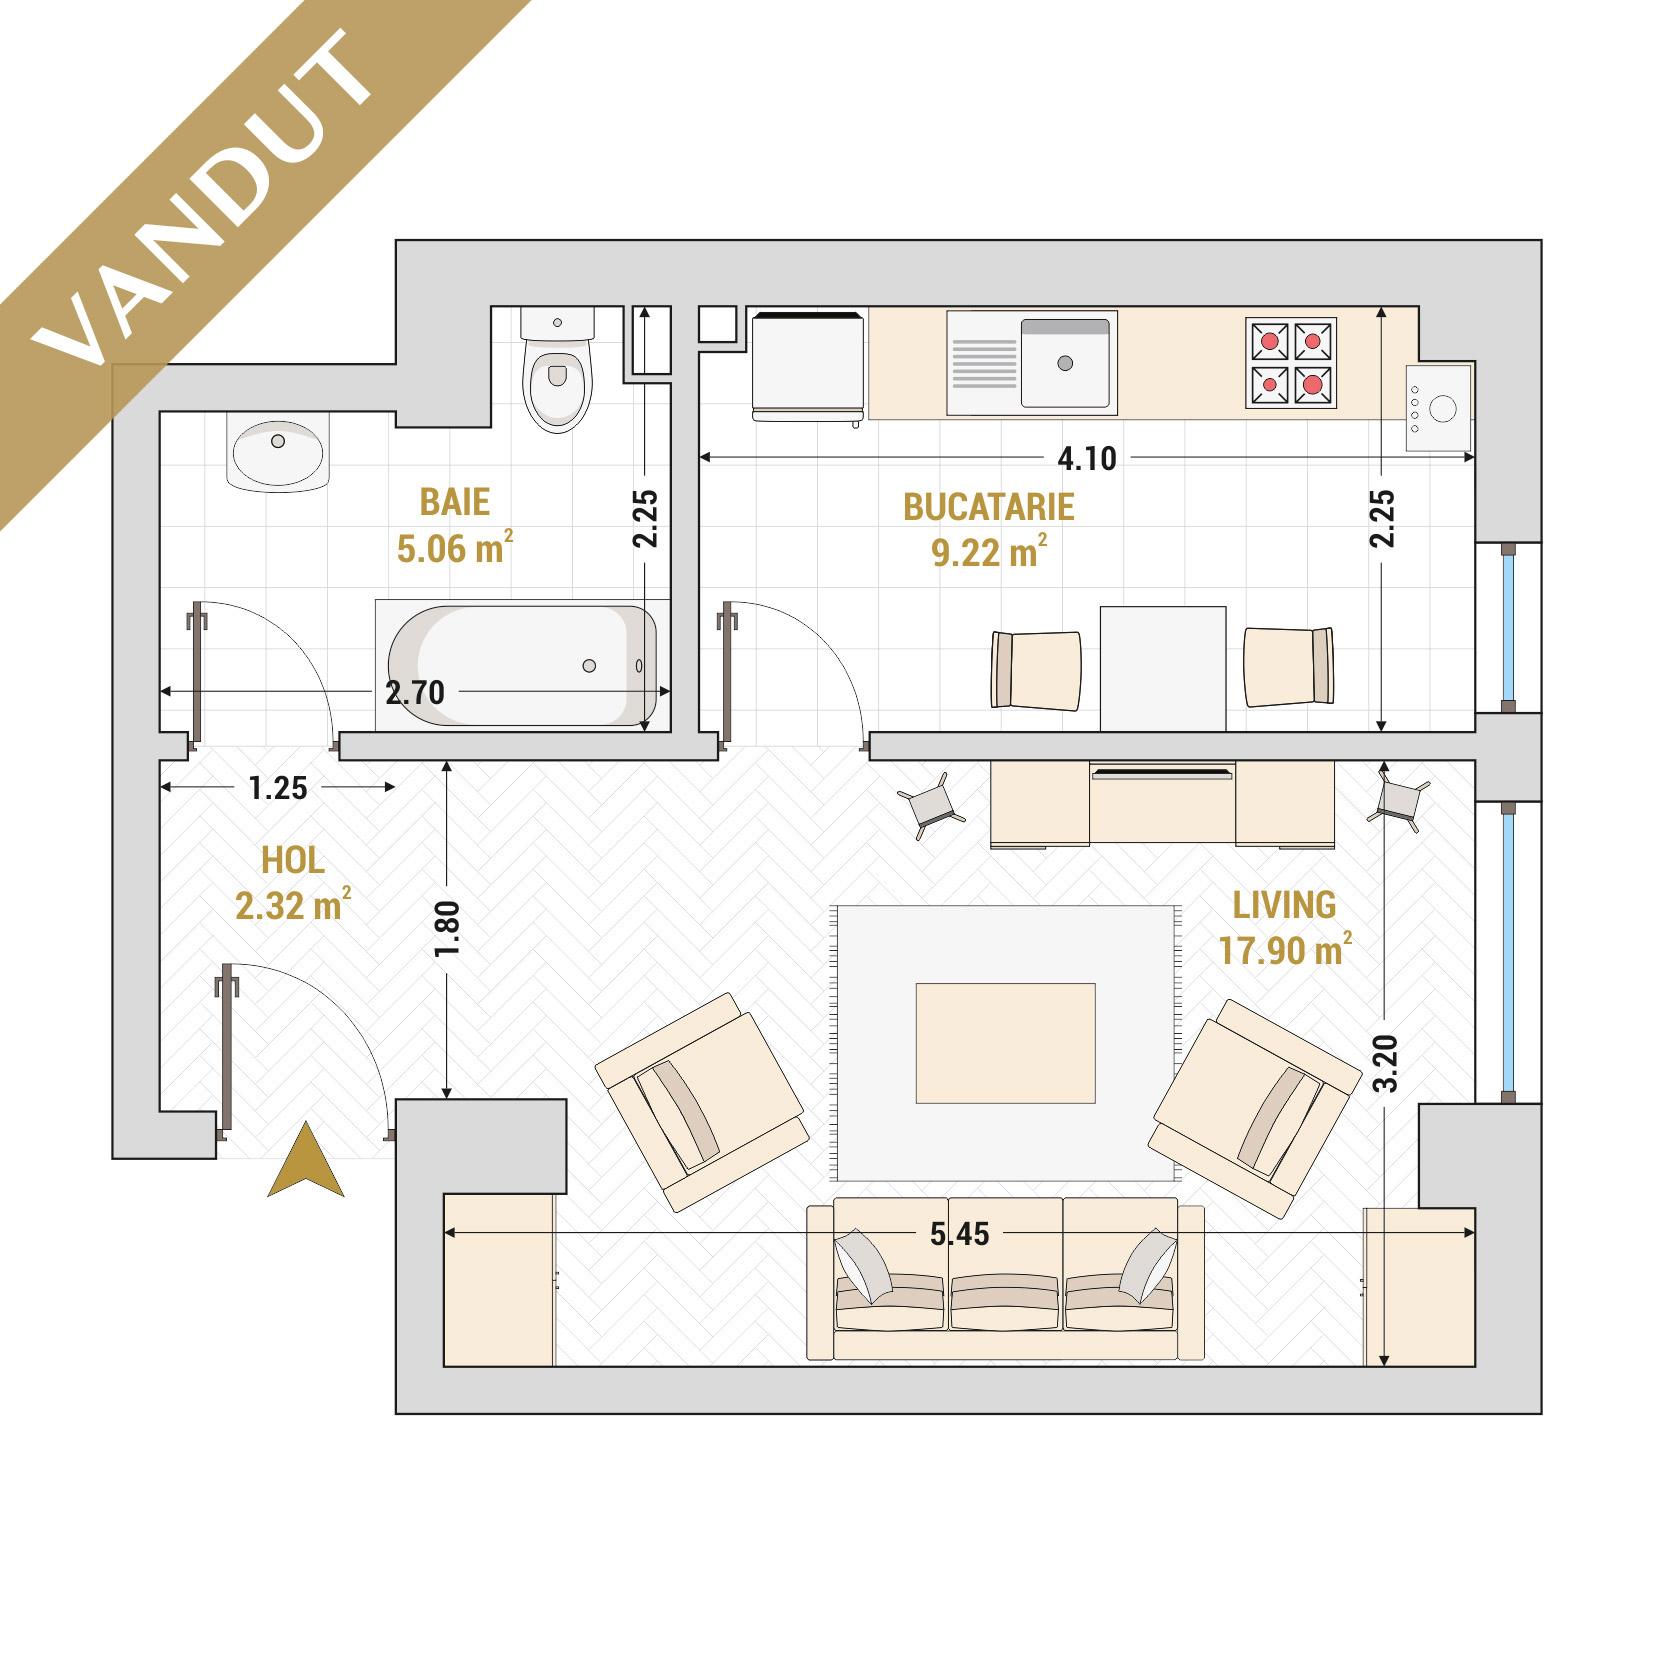 Garsoniere de vanzare Bucuresti - Catedral Residence - Marriott, Piata Unirii, 13 Septembrie, Izvor - Tip 1 - T2 - V